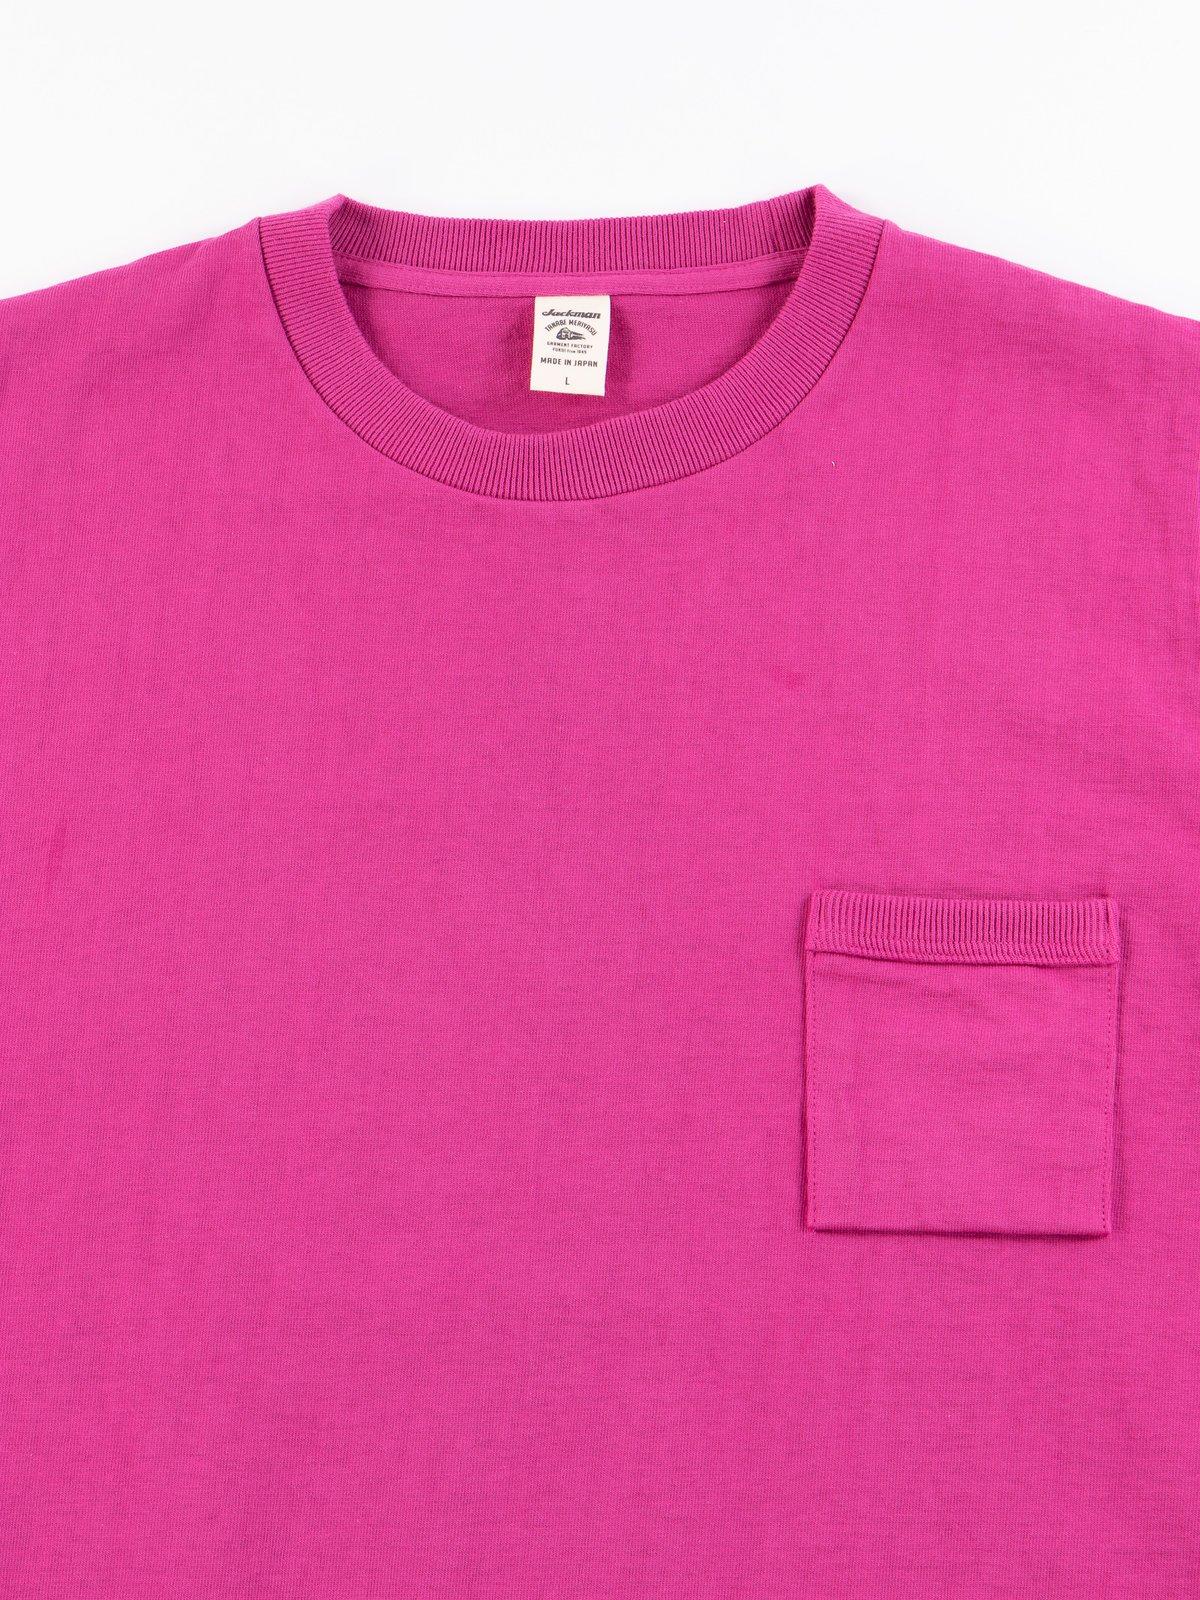 Ash Rose Dotsume Pocket T–Shirt - Image 3